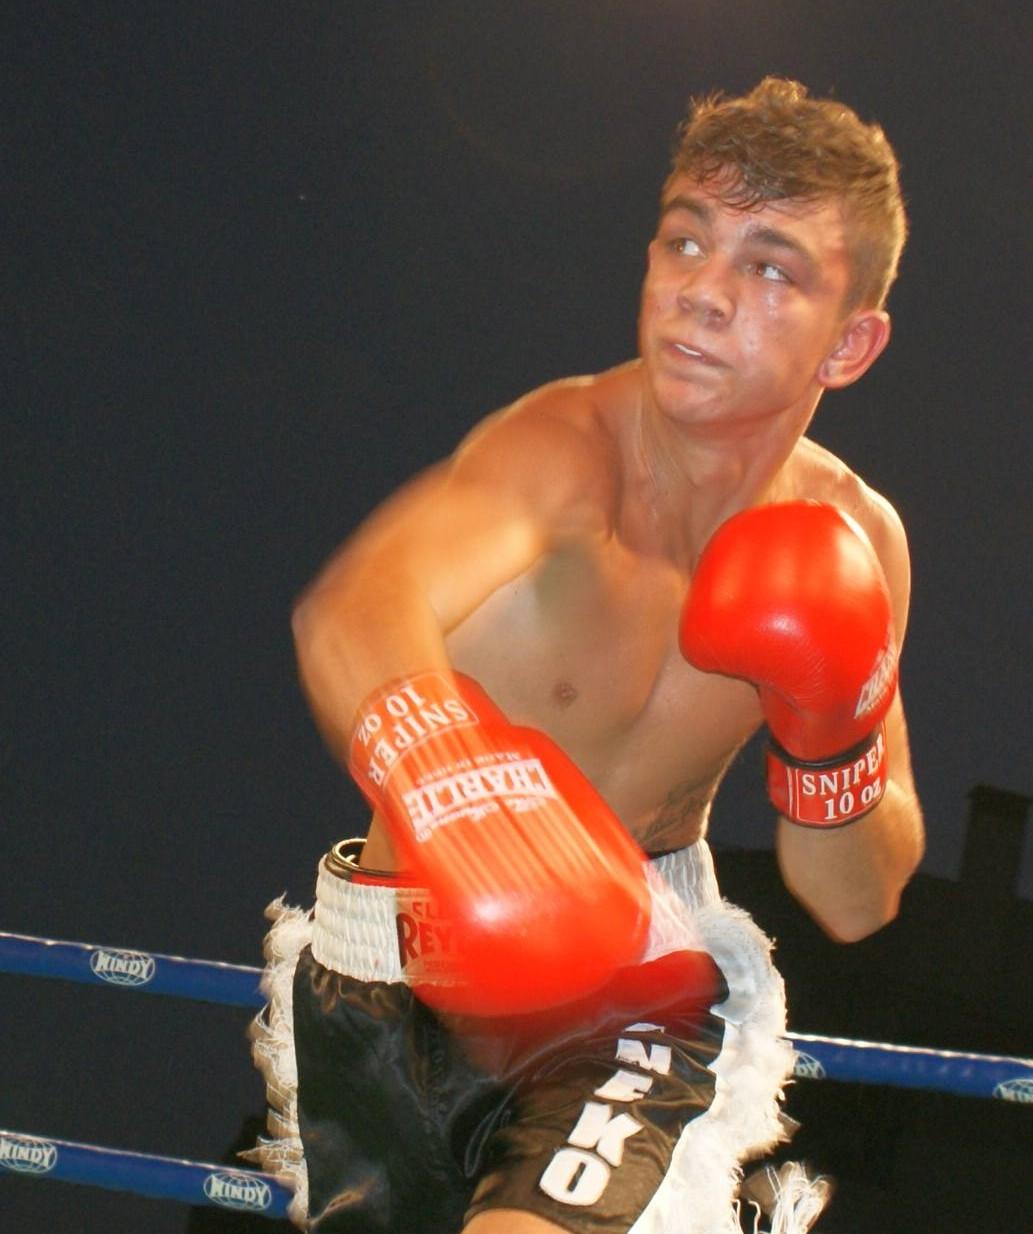 El boxeador de Etxebarri, Jon Fernández